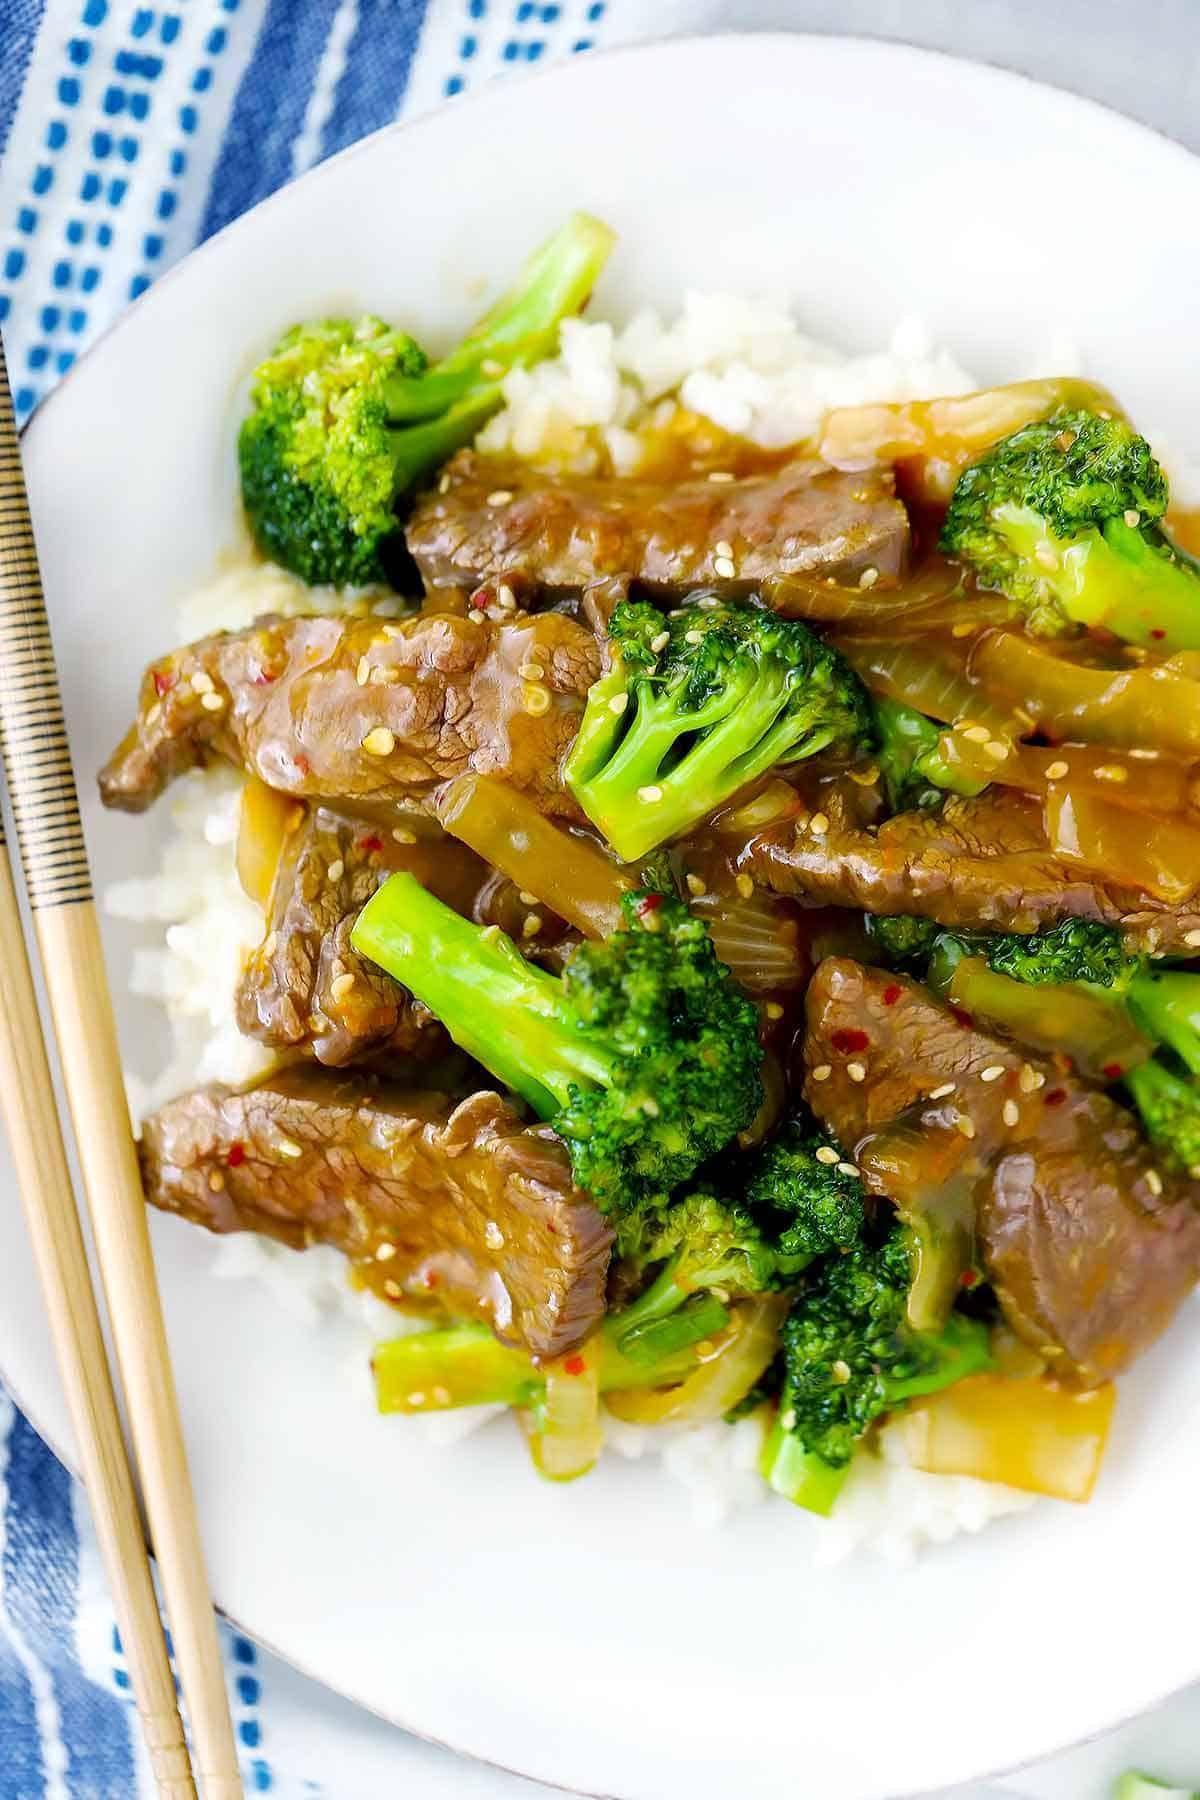 Easy Beef And Broccoli Recipe Broccoli Beef Broccoli Recipes Easy Beef And Broccoli